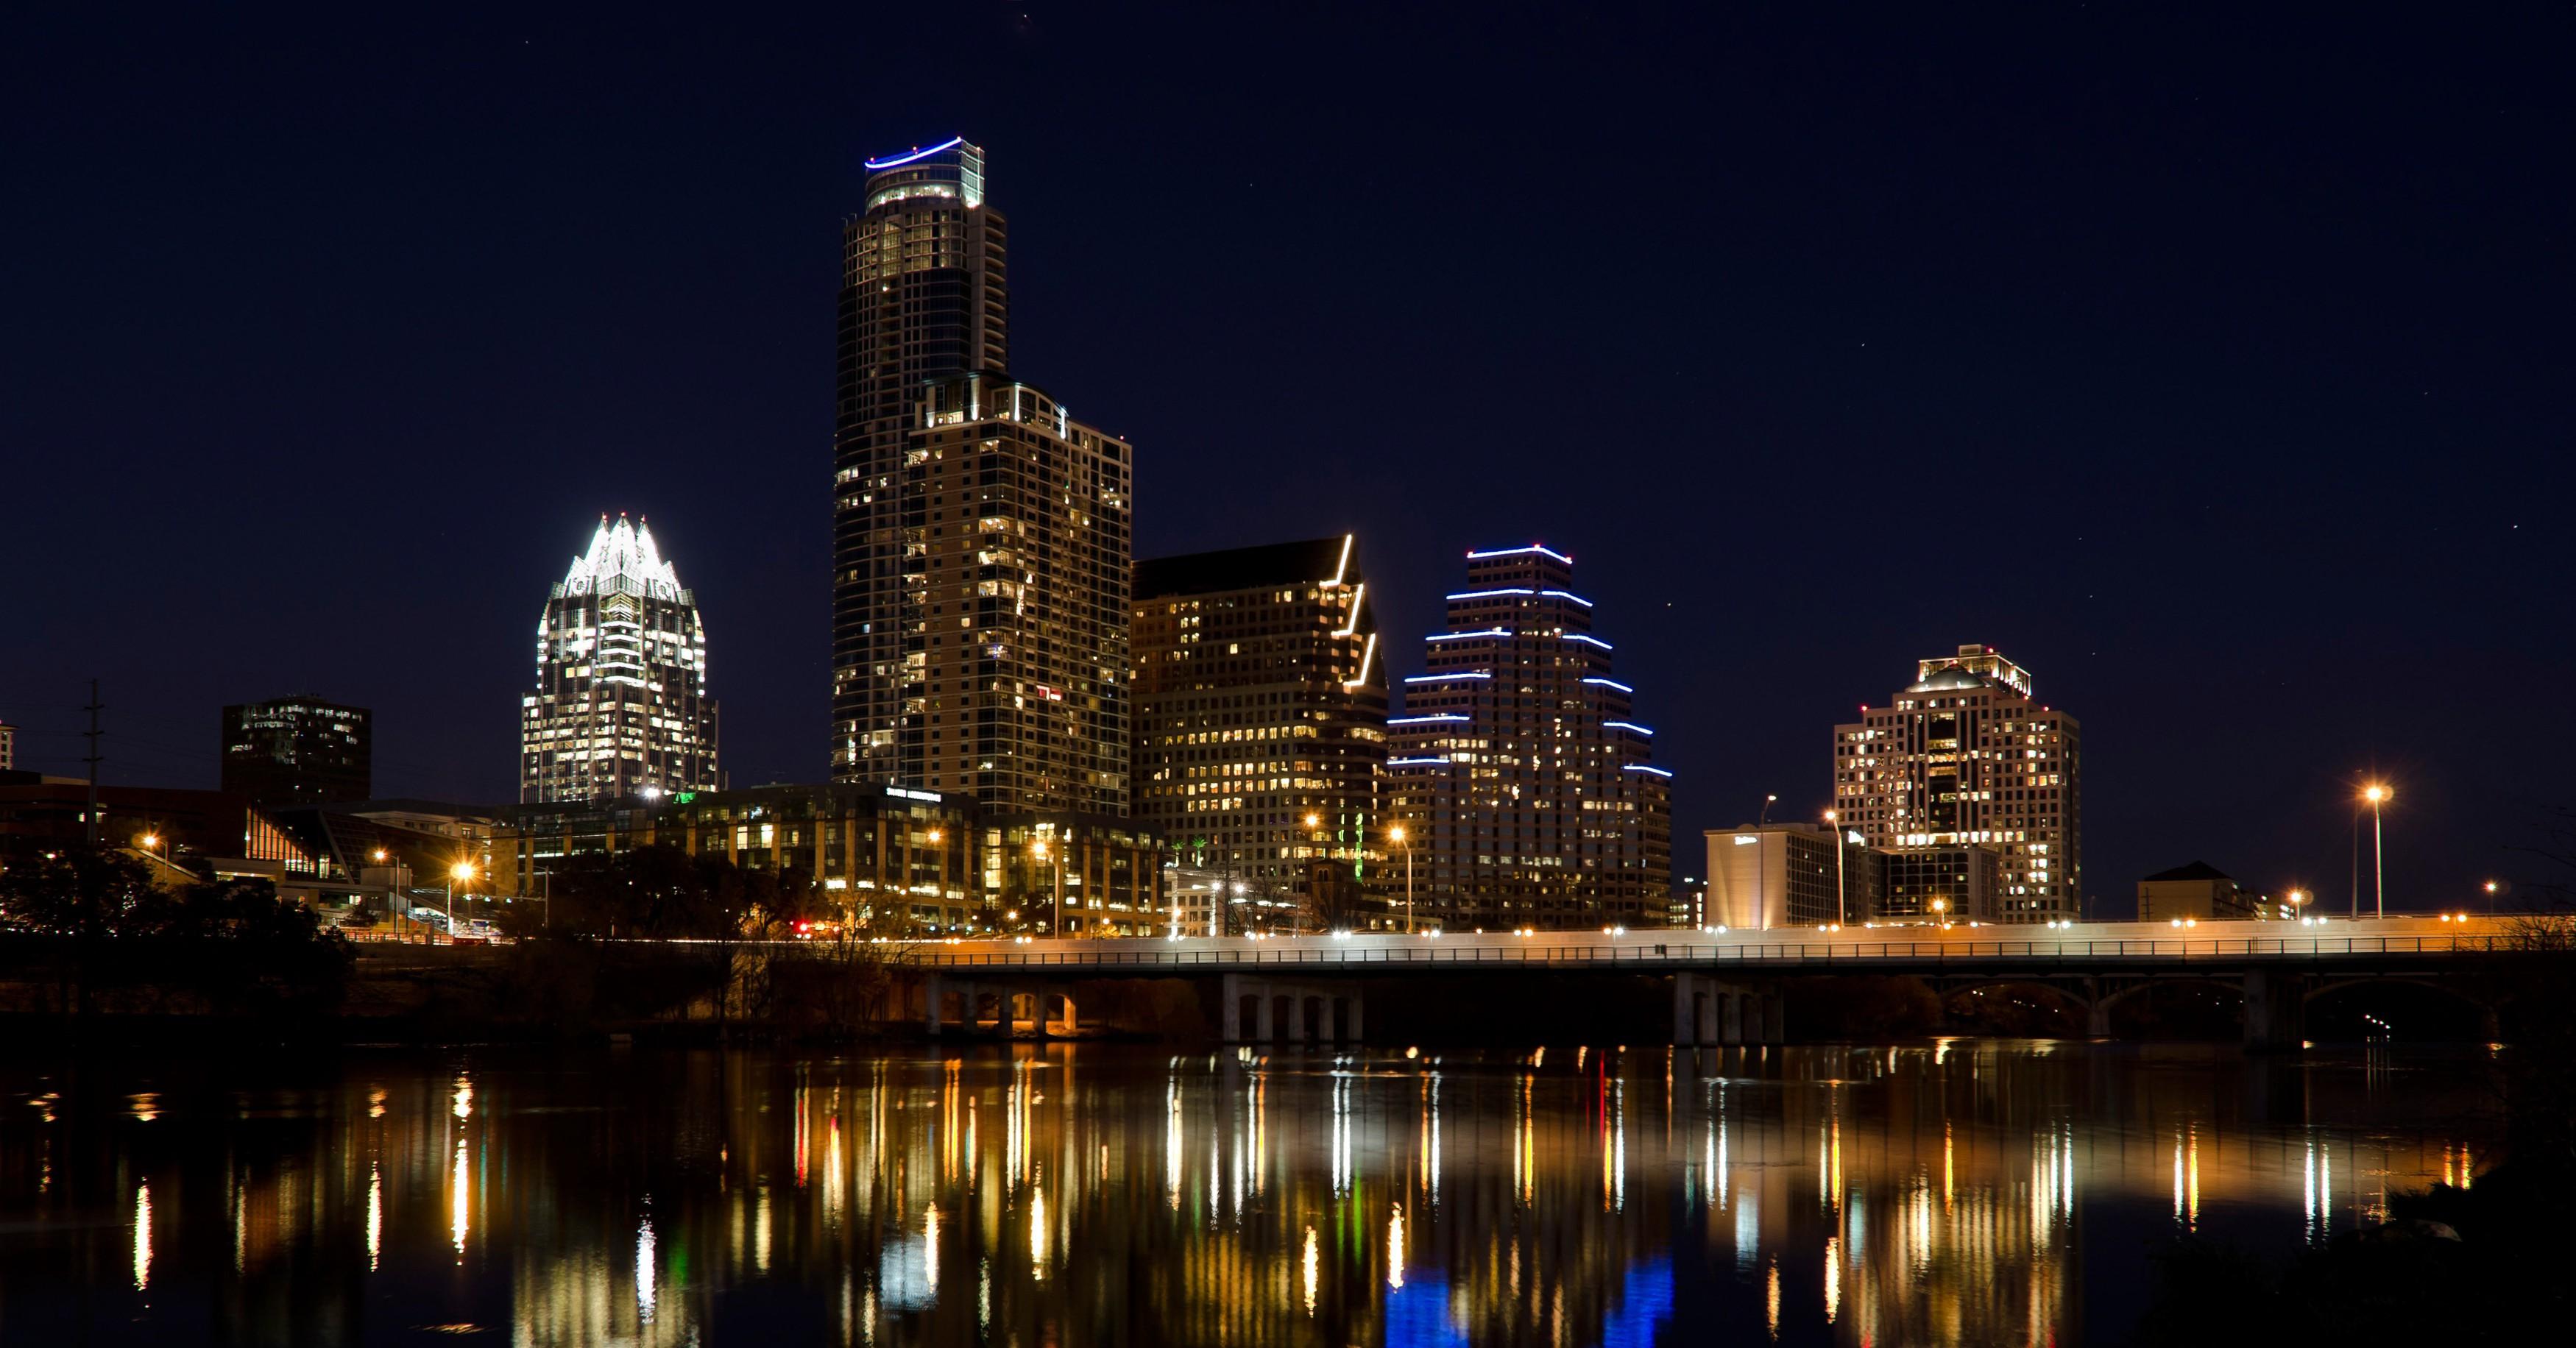 Skyline at night from across Lady Bird Lake, Austin, Texas, USA.